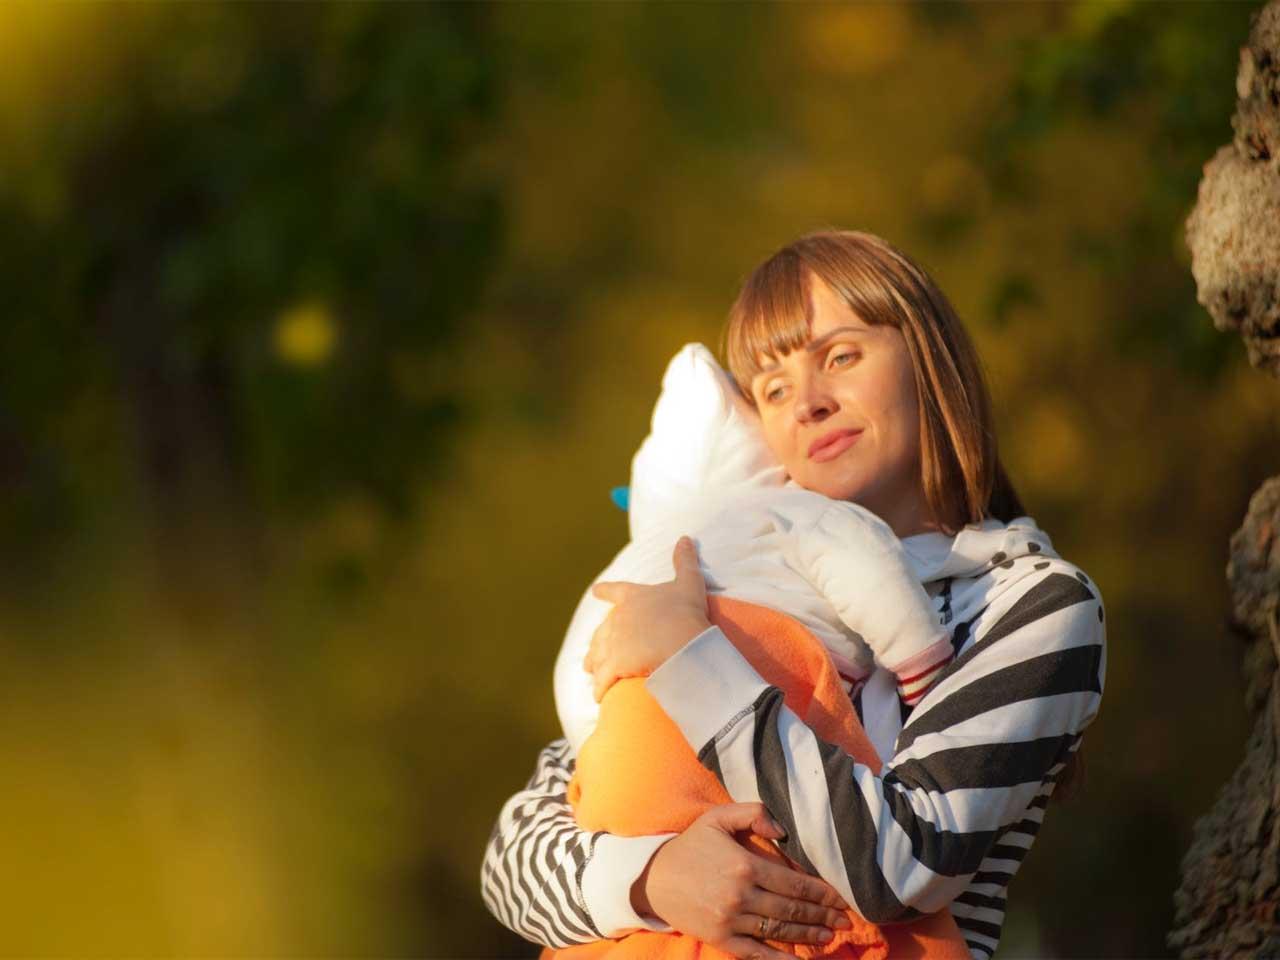 Sweden, Swedish parents, parental leave, maternity